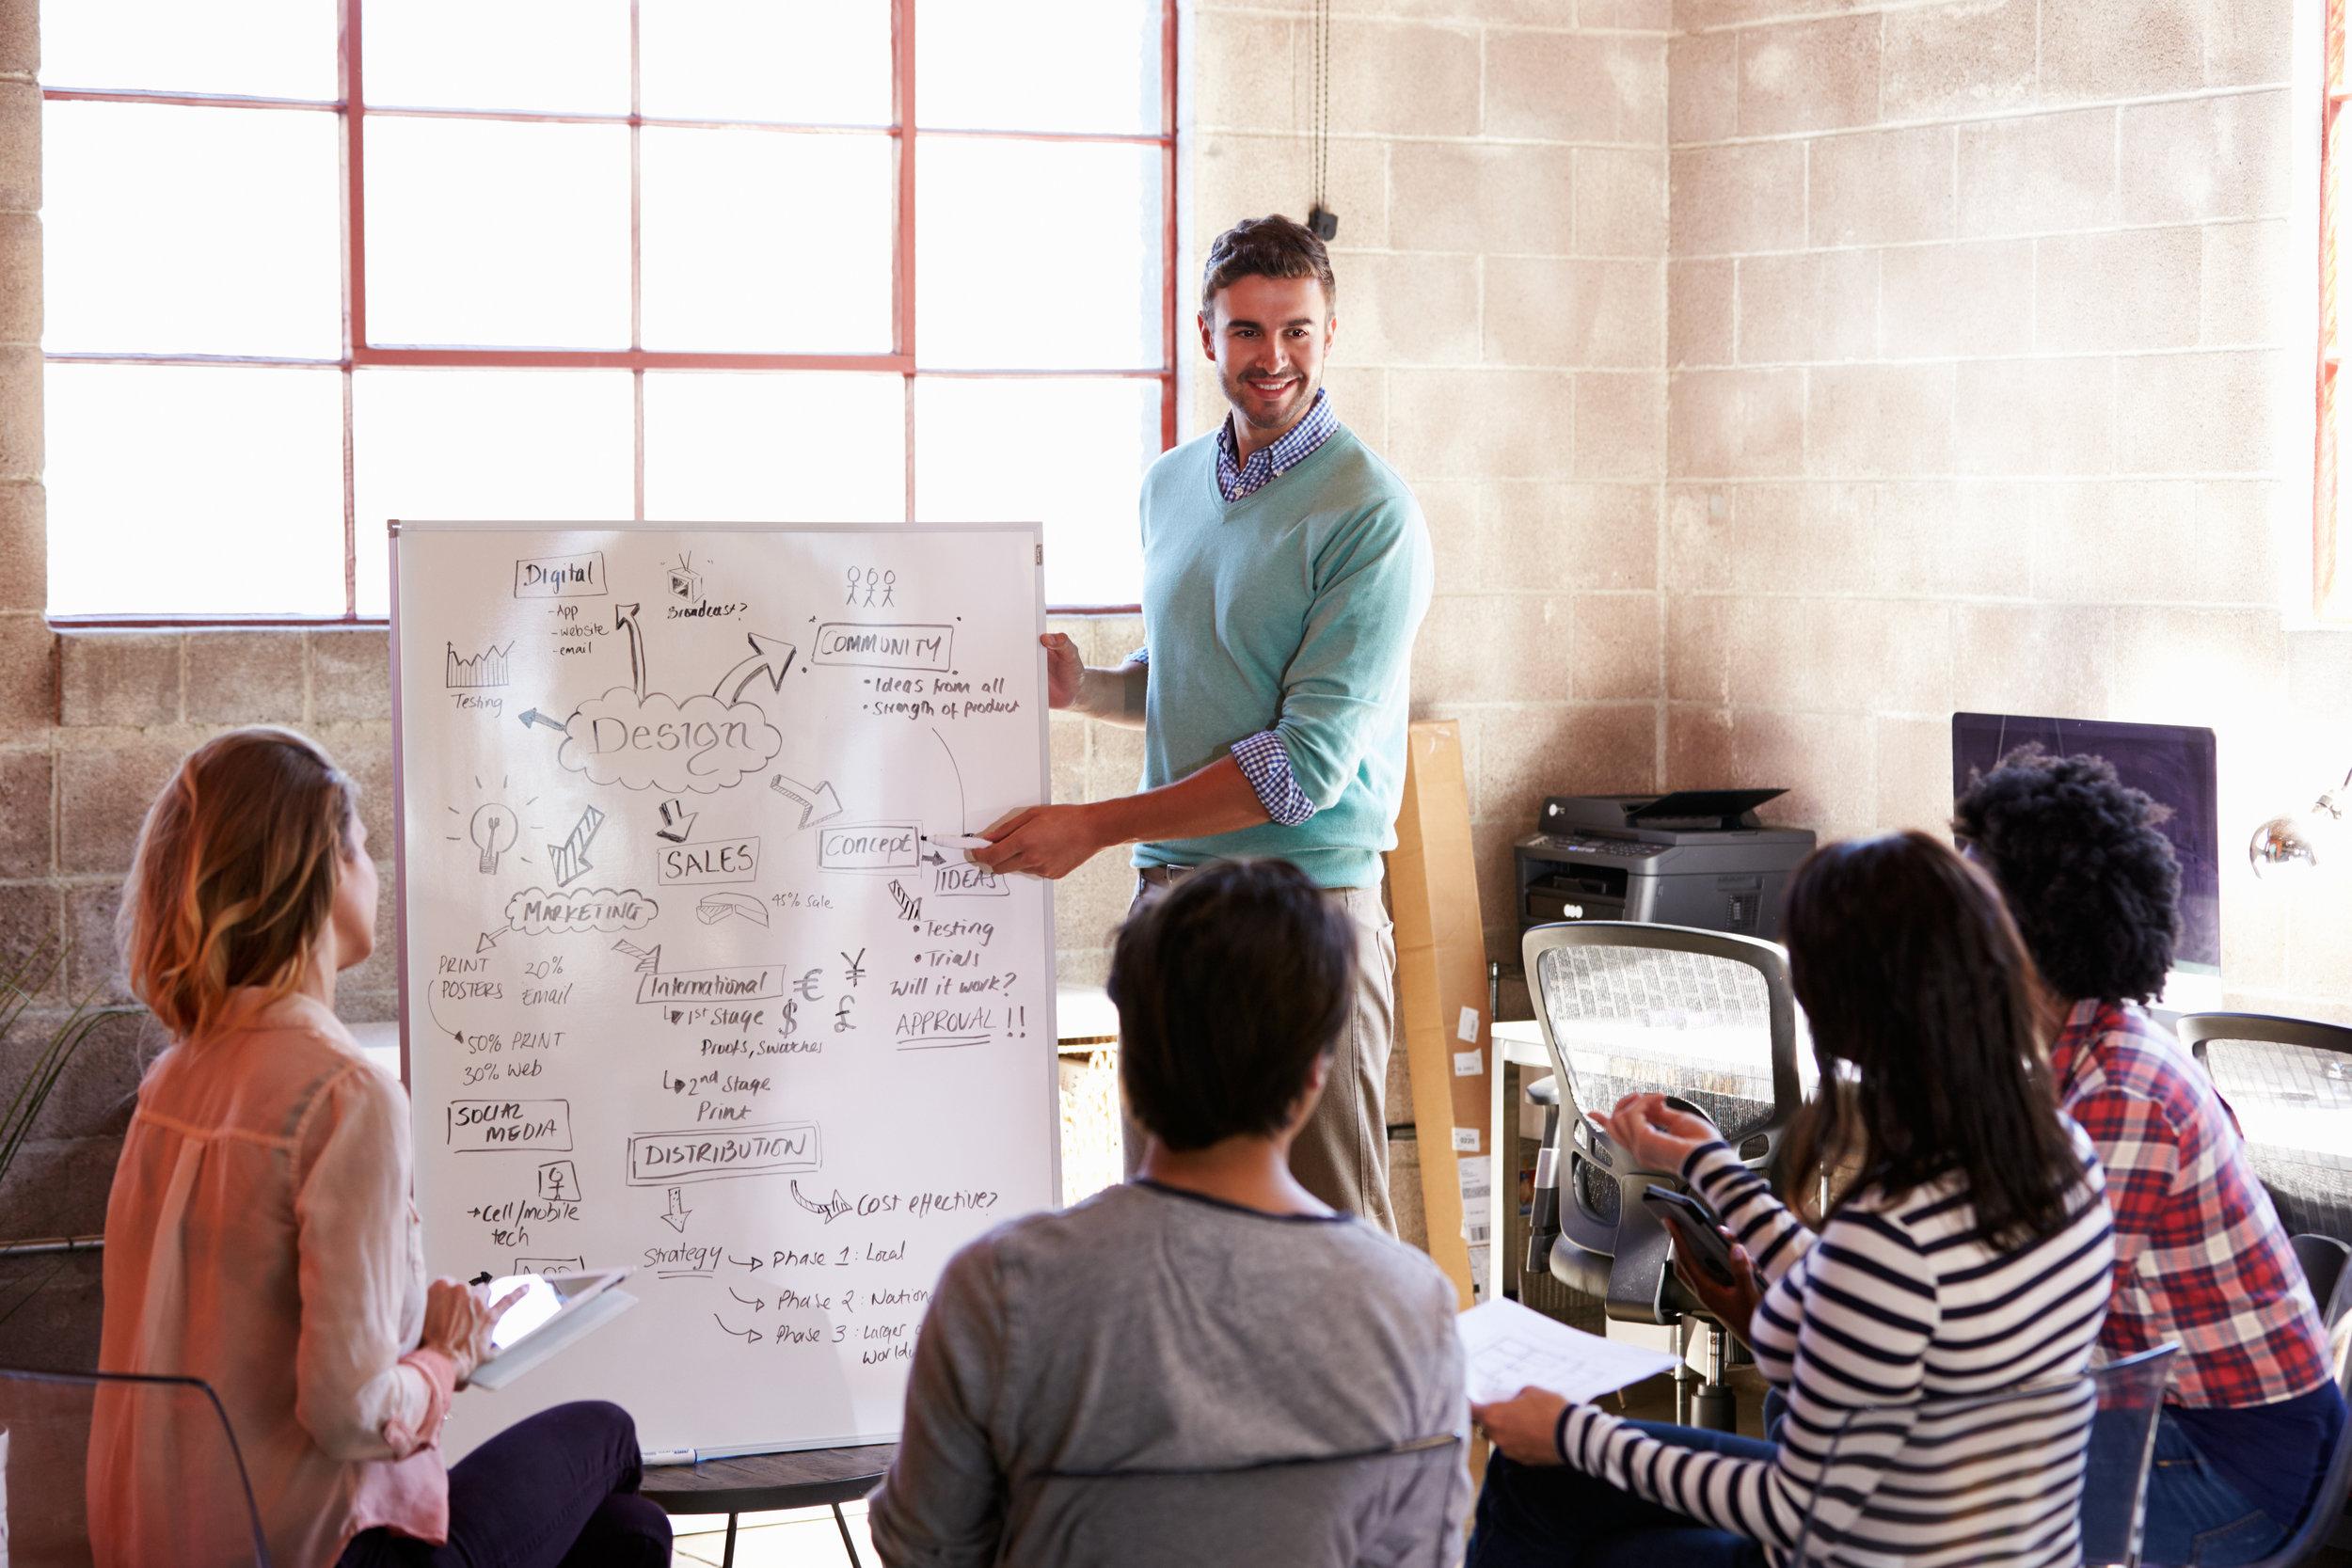 Data-driven Behavior Change® Tools